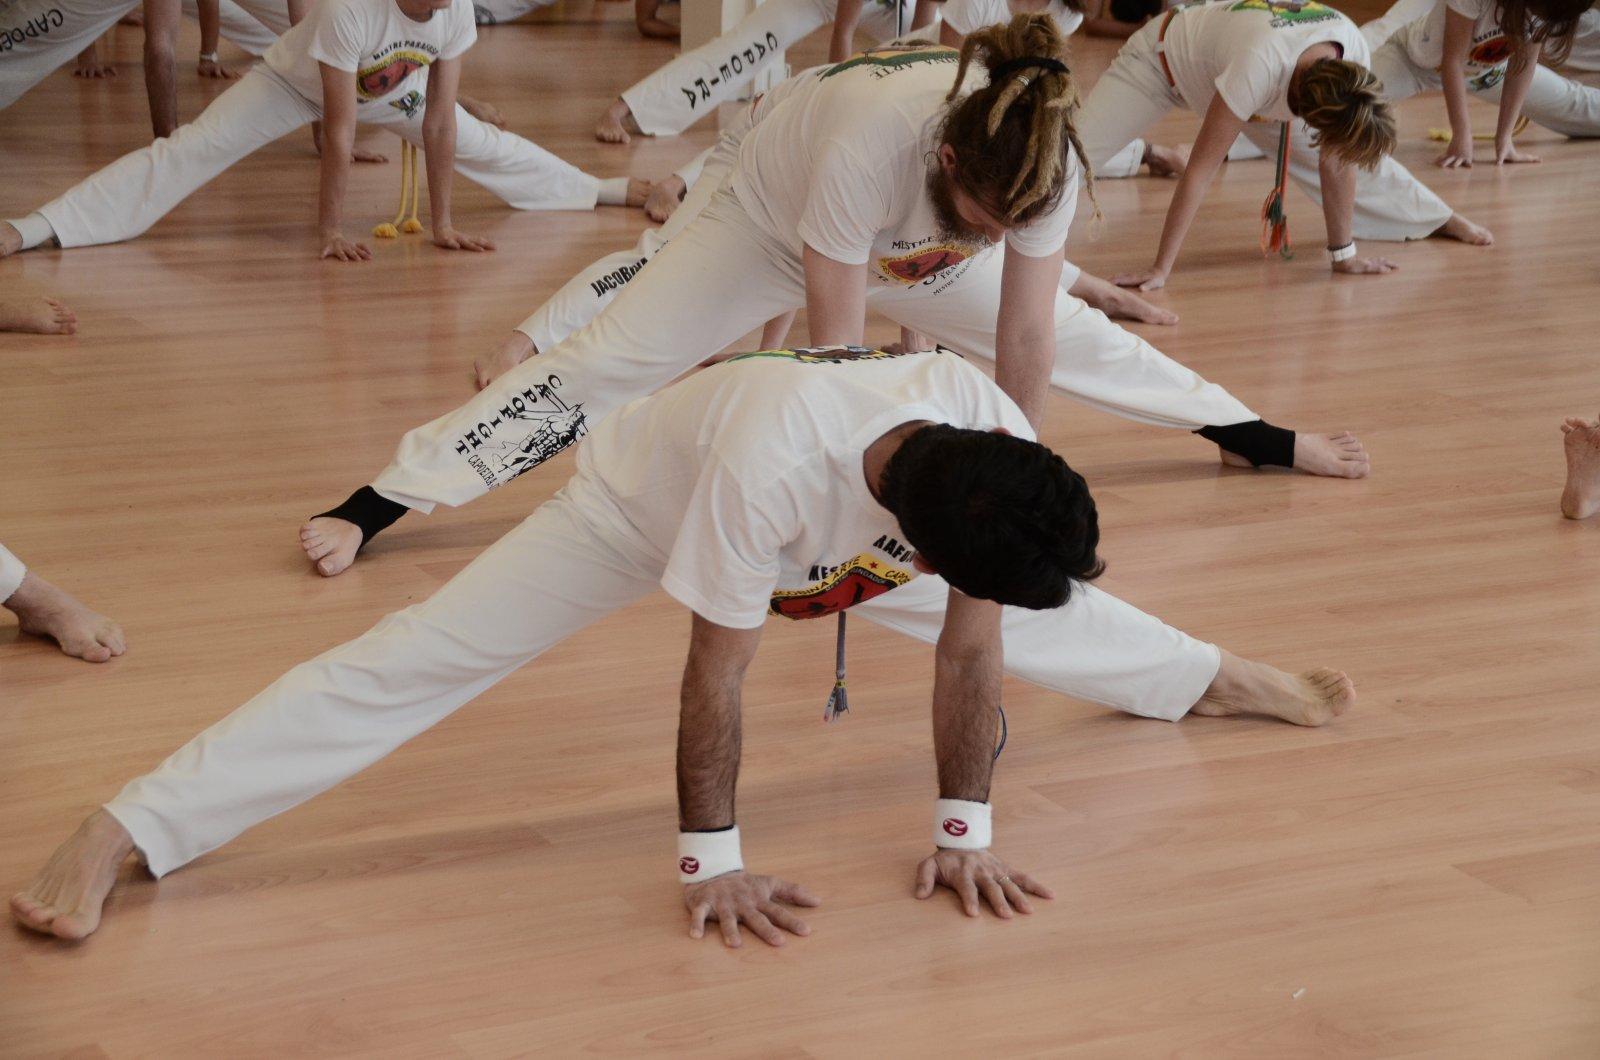 Roda E Galette 2018 Capoeira Nantes (2)